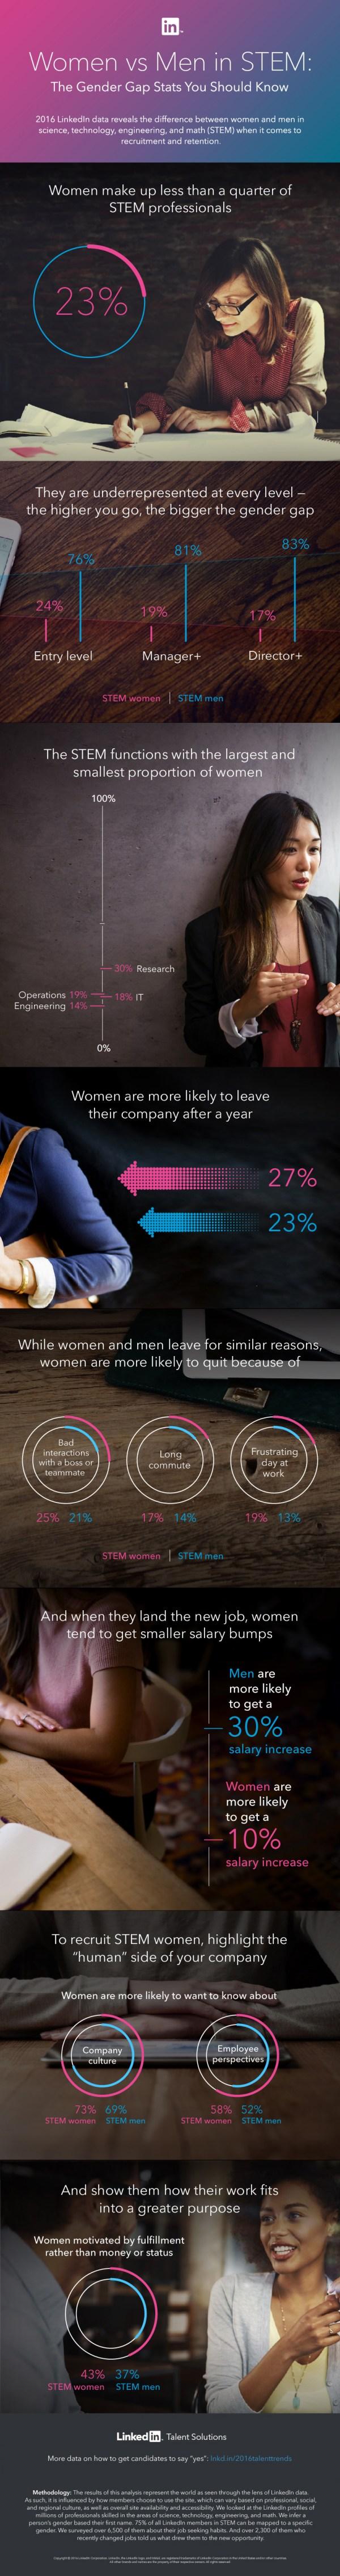 Women in Stem Infographic